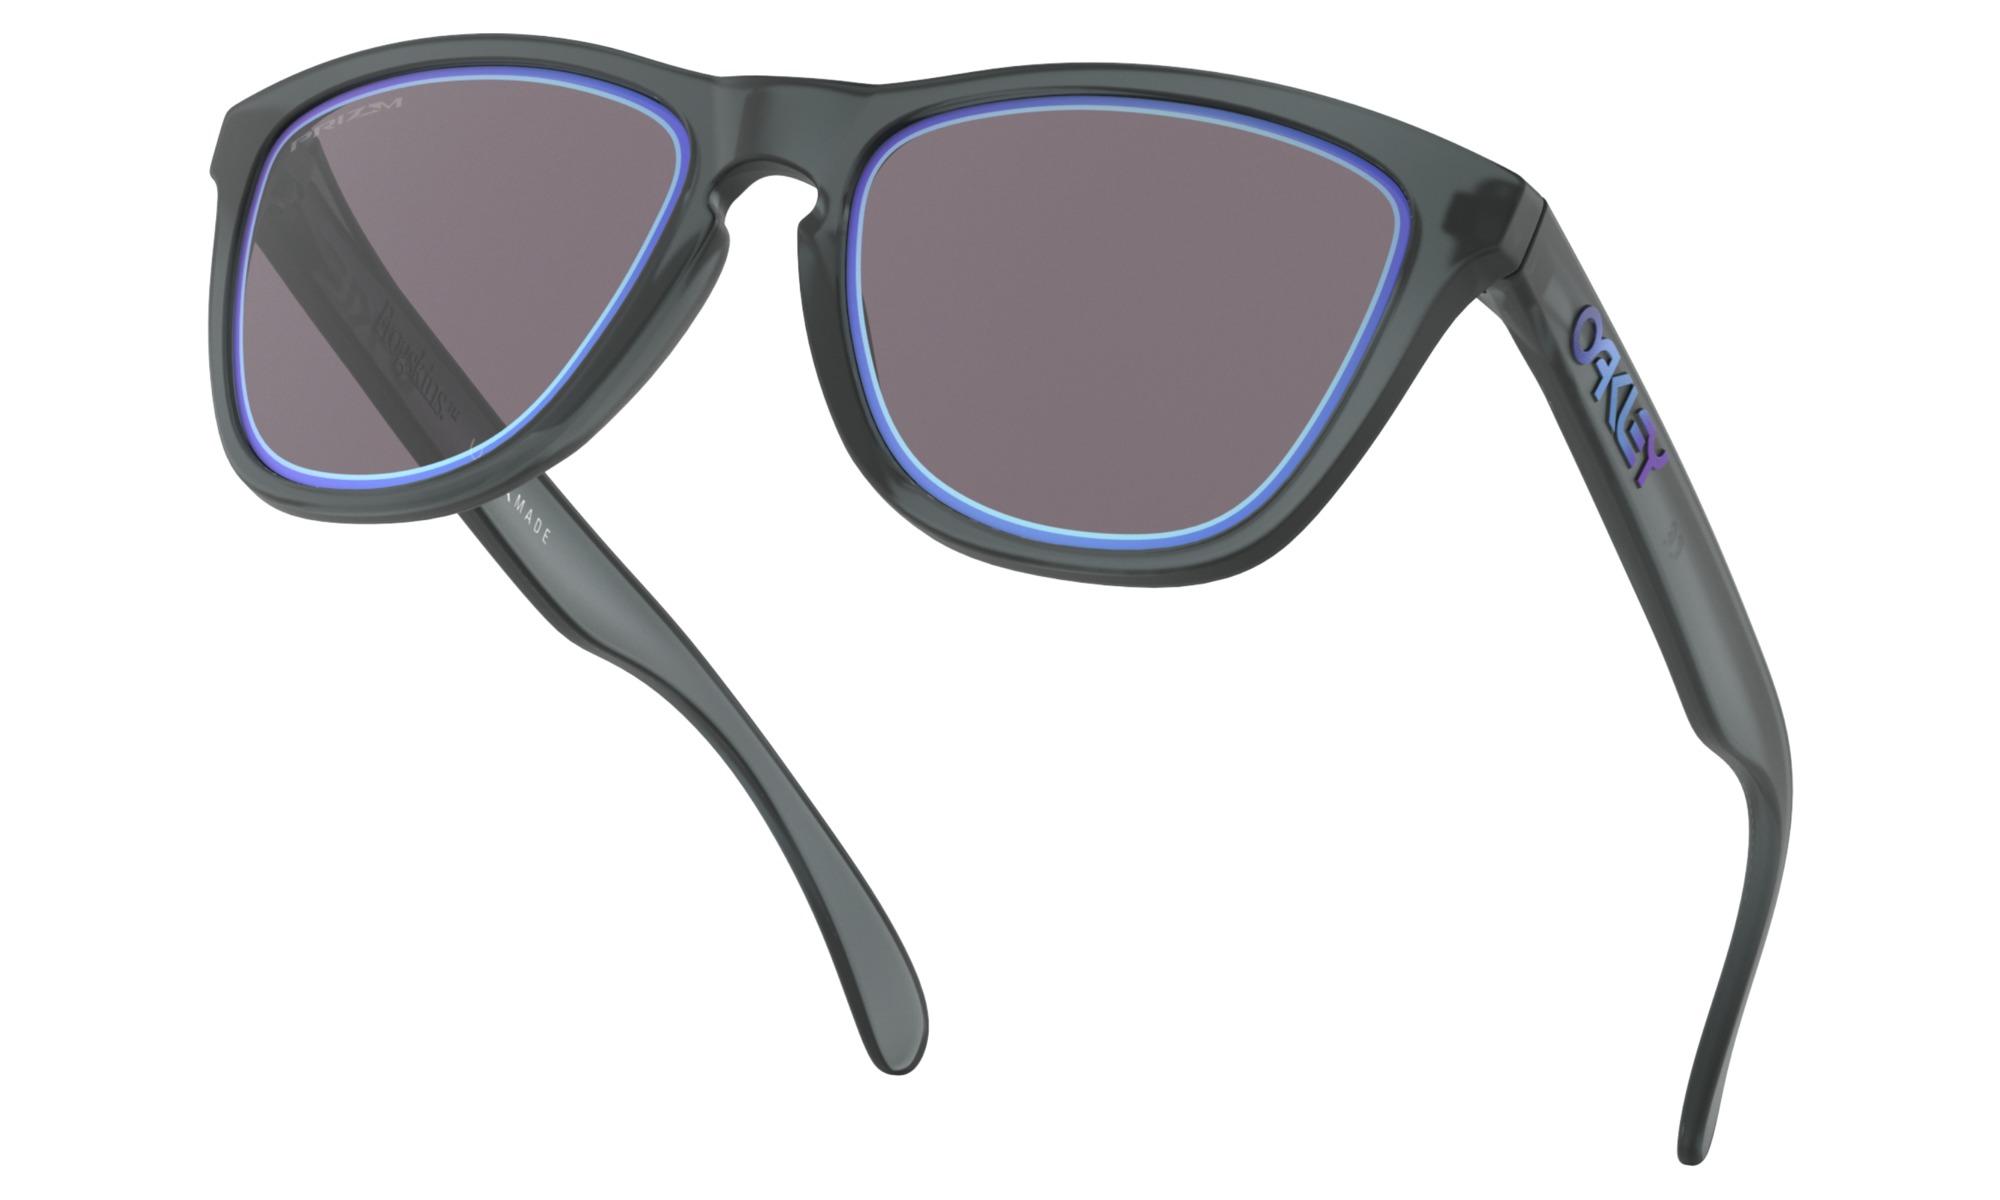 Okuliare Oakley Frogskins Prizm OO9013-E355  cadc3021b49